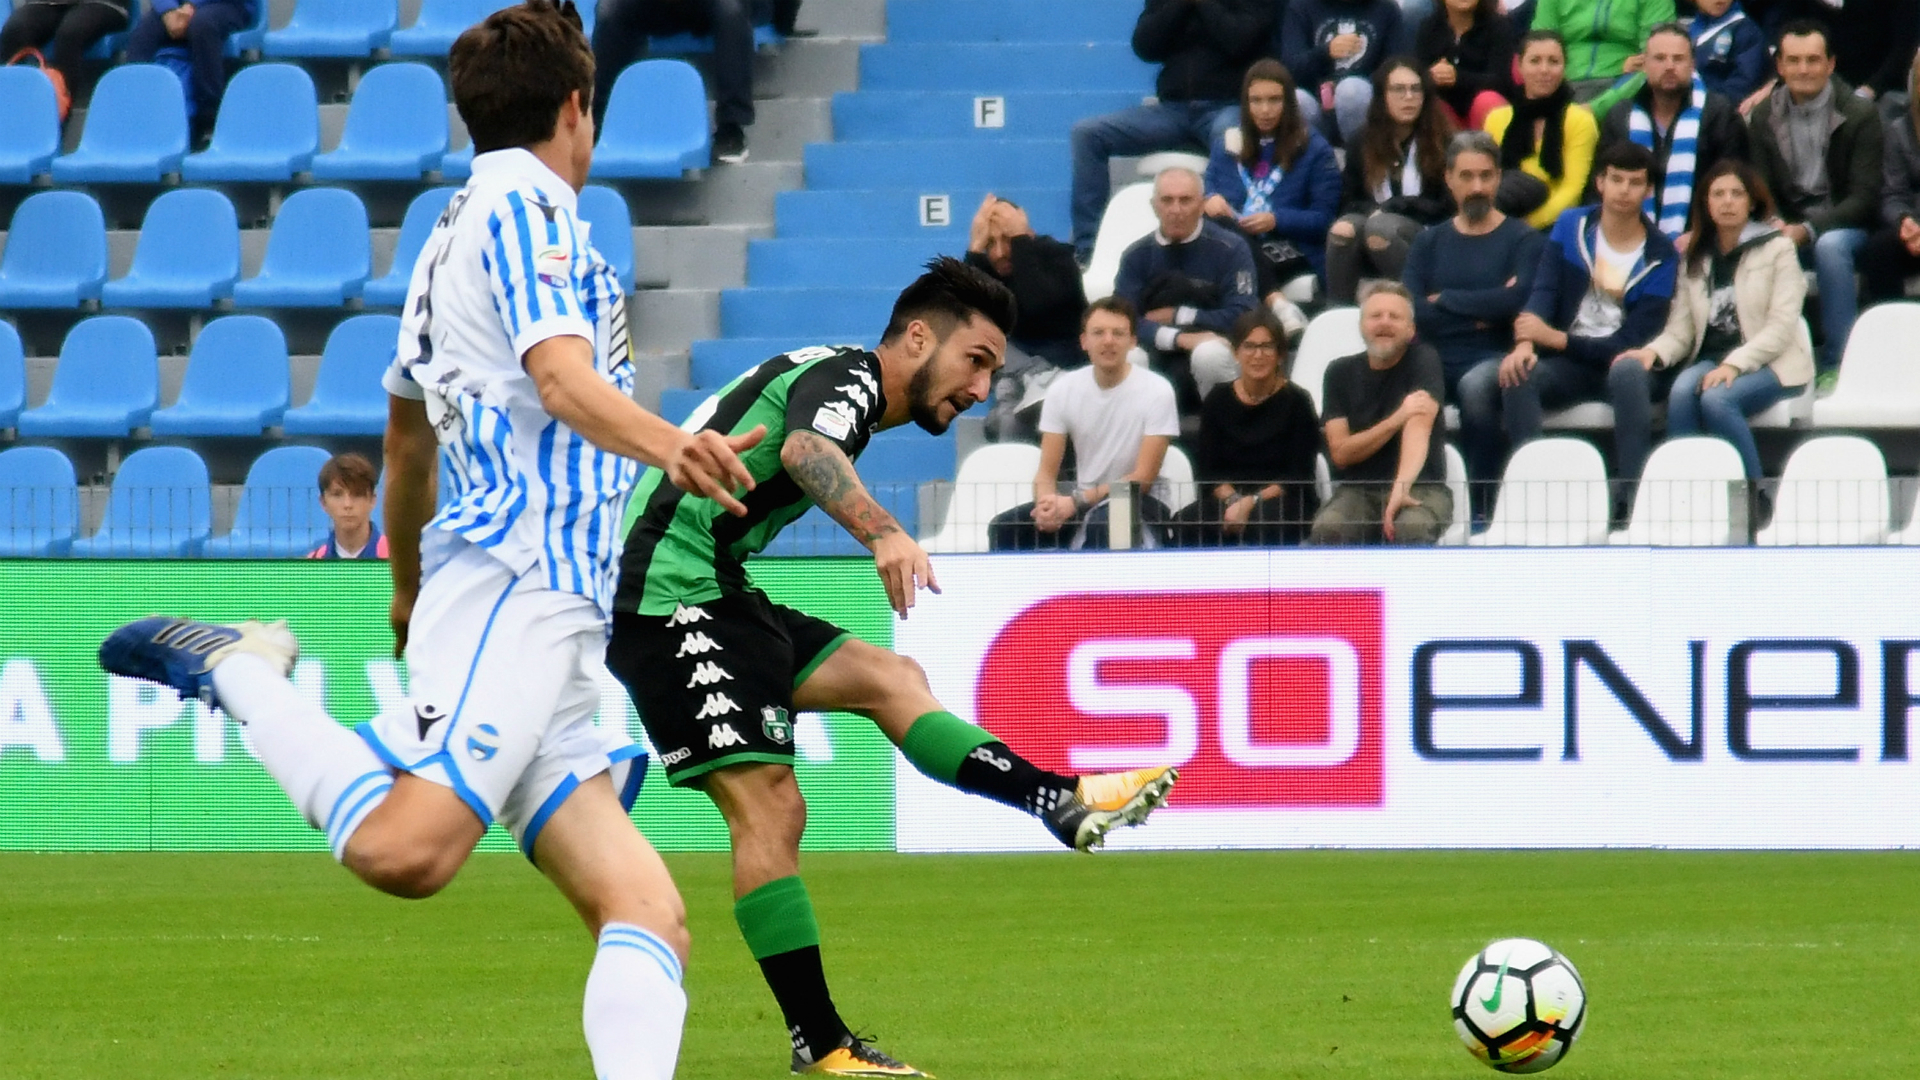 Sassuolo-Spal 1-1, ad Antenucci risponde Babacar su rigore